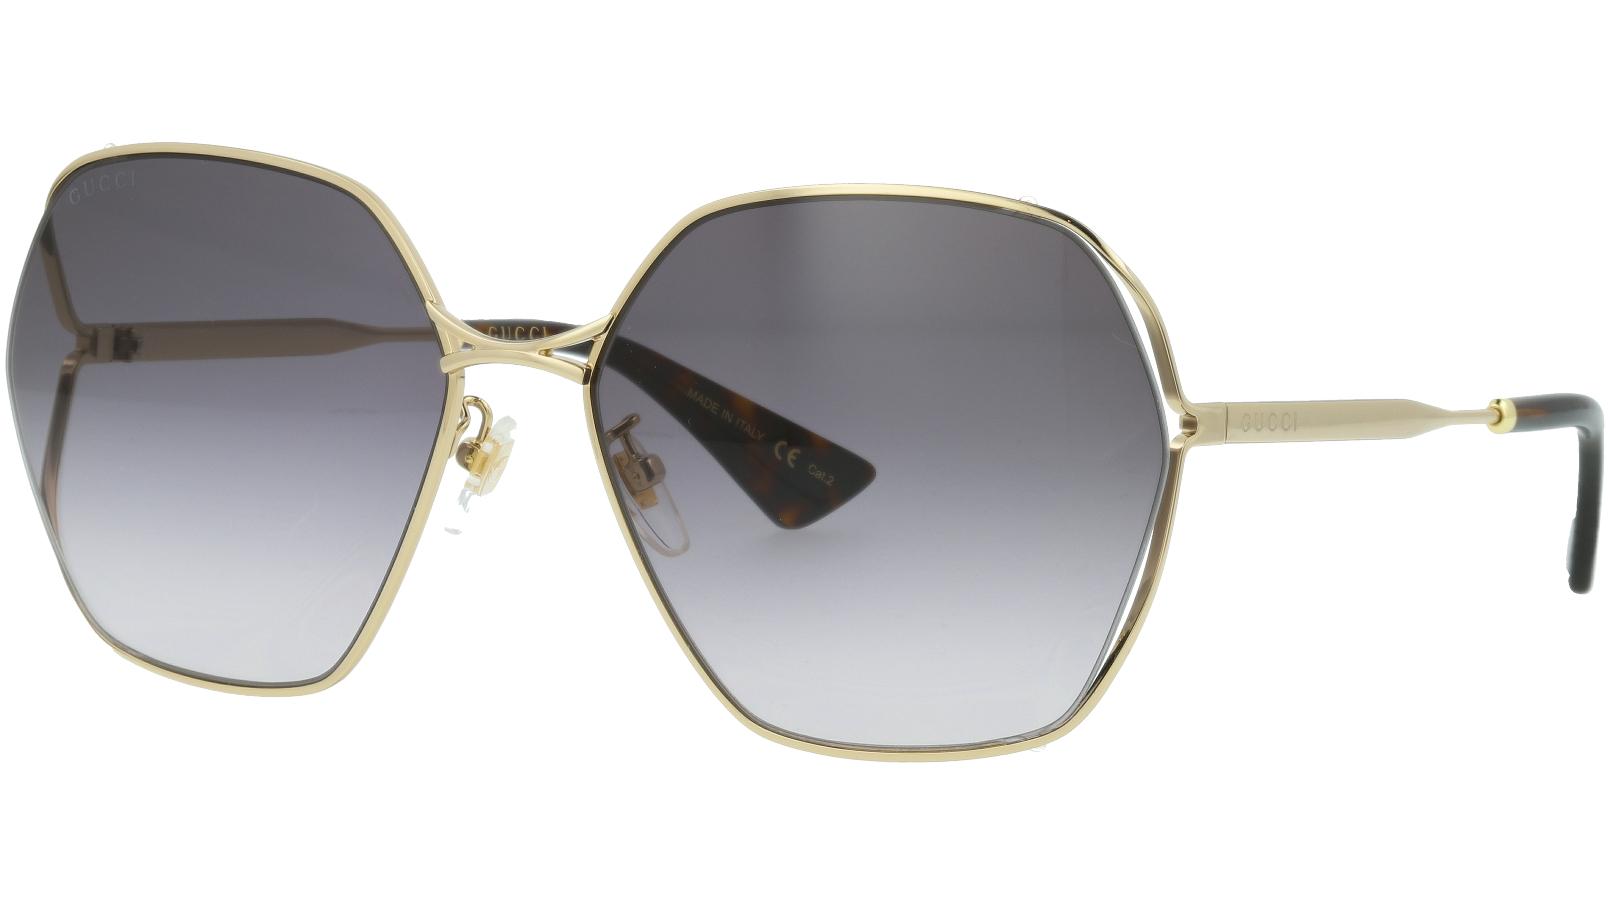 Gucci GG0818SA 001 63 Gold Full-Rim Sunglasses